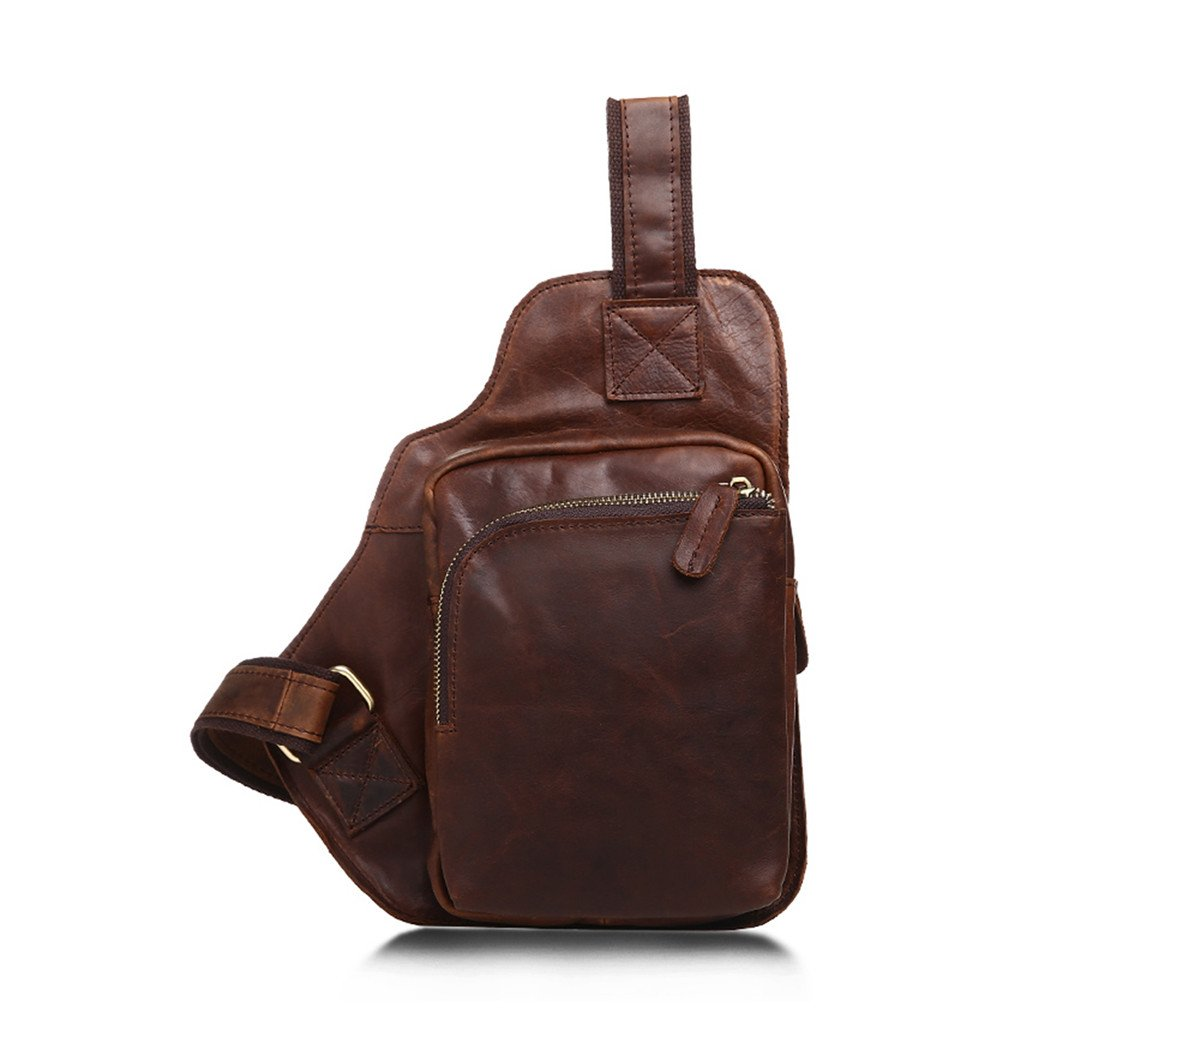 JOYIR Estilo Completo Sling Bag Piel de auténtica Piel Bag de Bolsillo en el Pecho de Cross Body Mini Mochila para Hombre 11c5f0